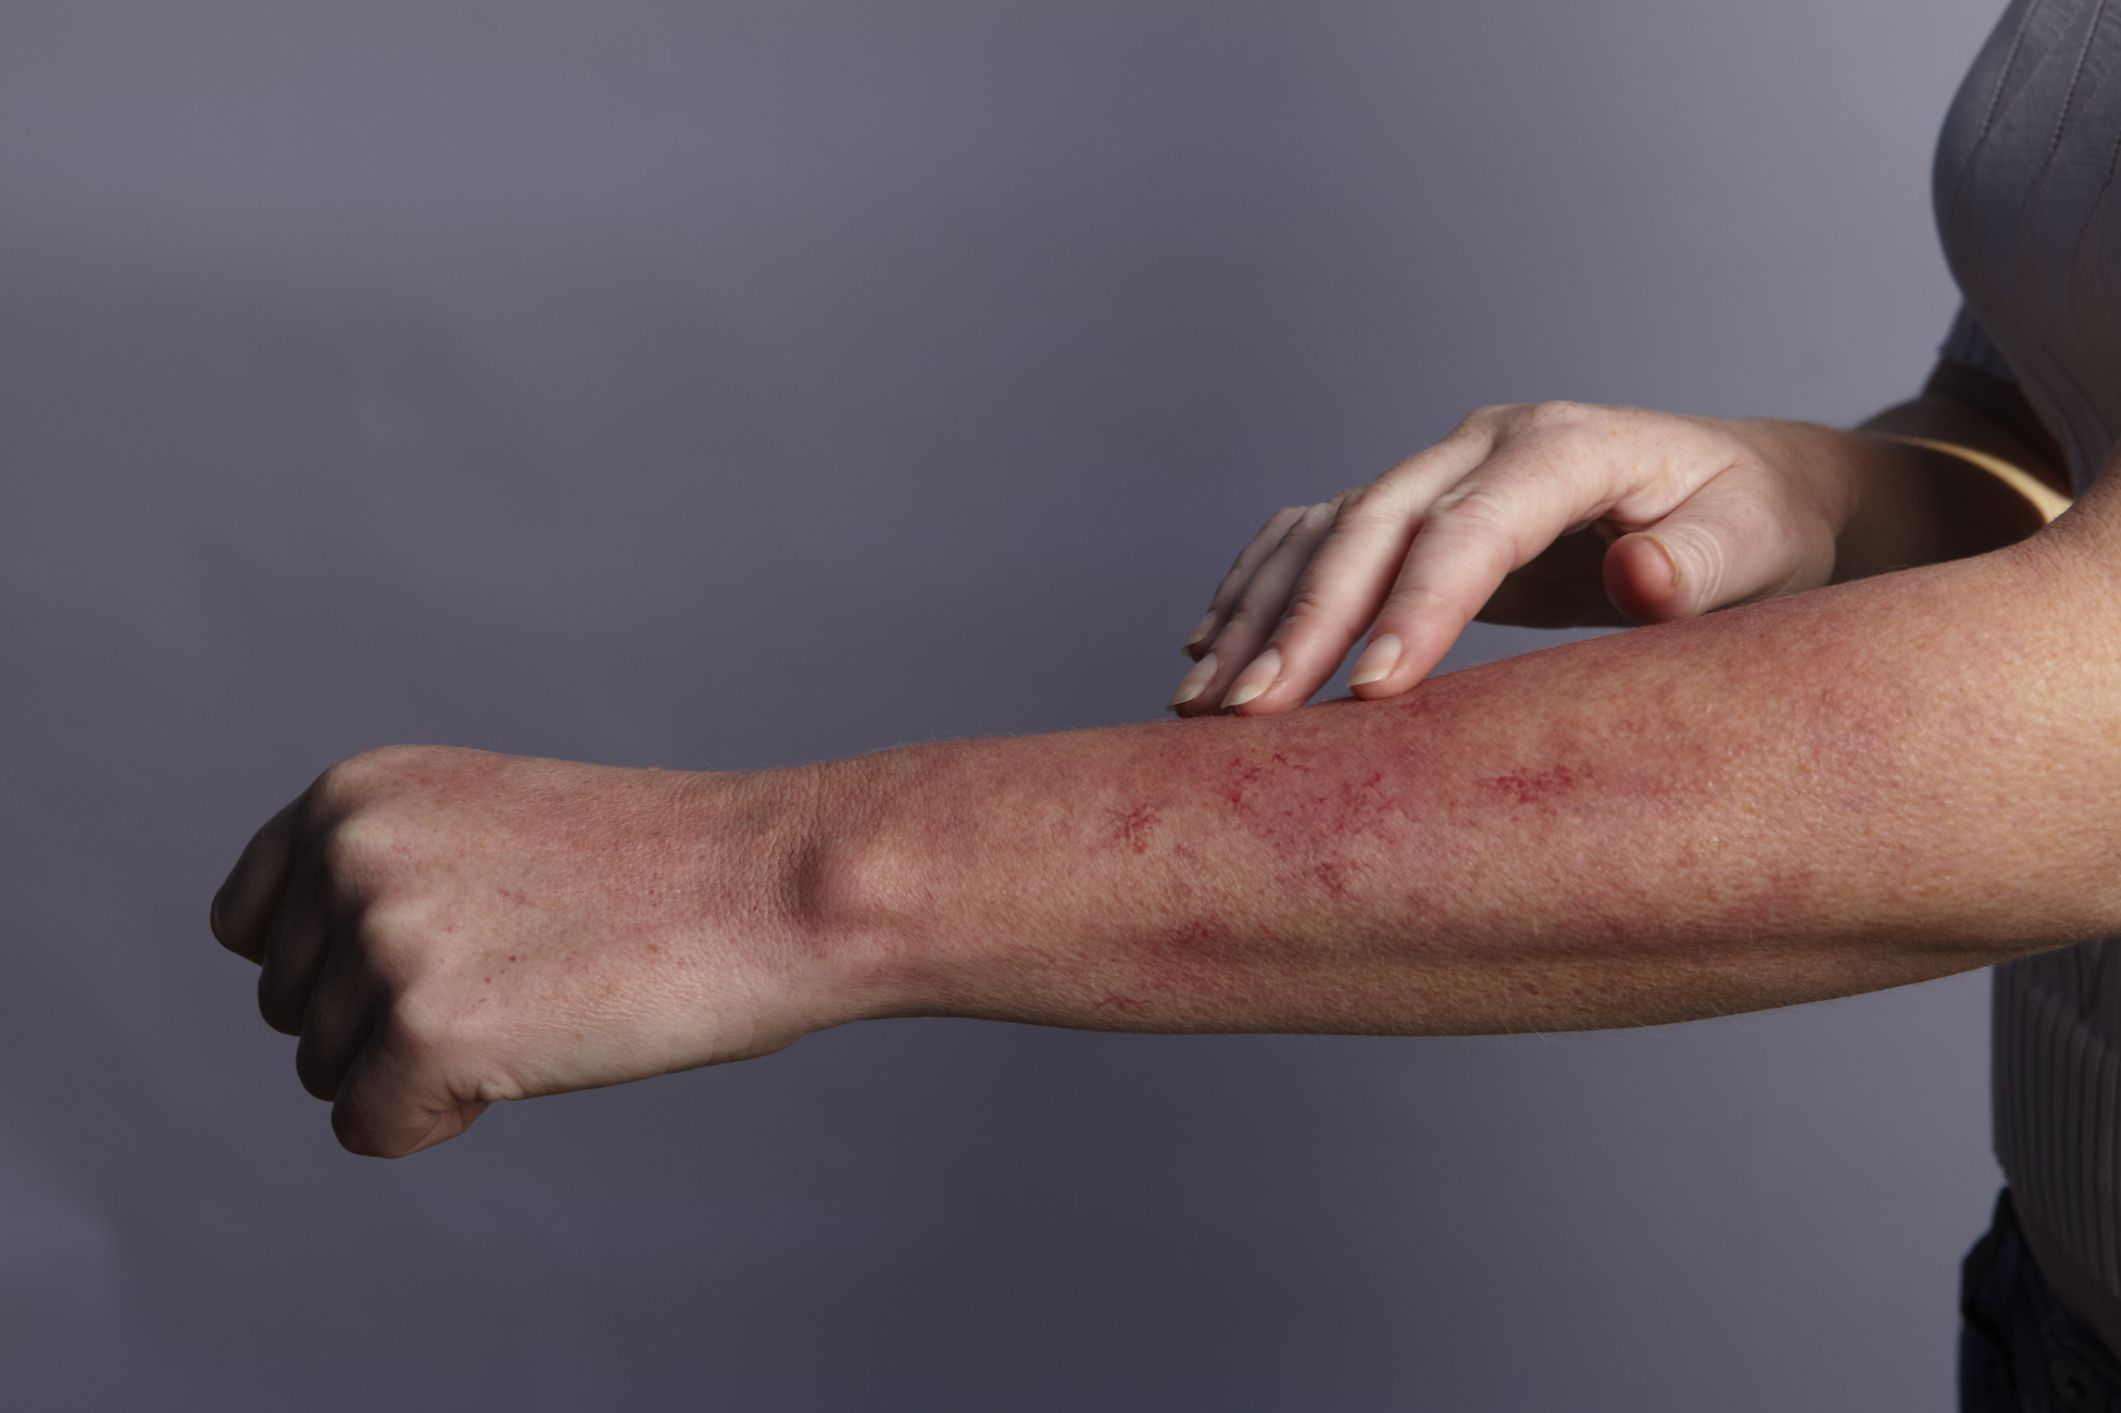 woman with skin rash on arm